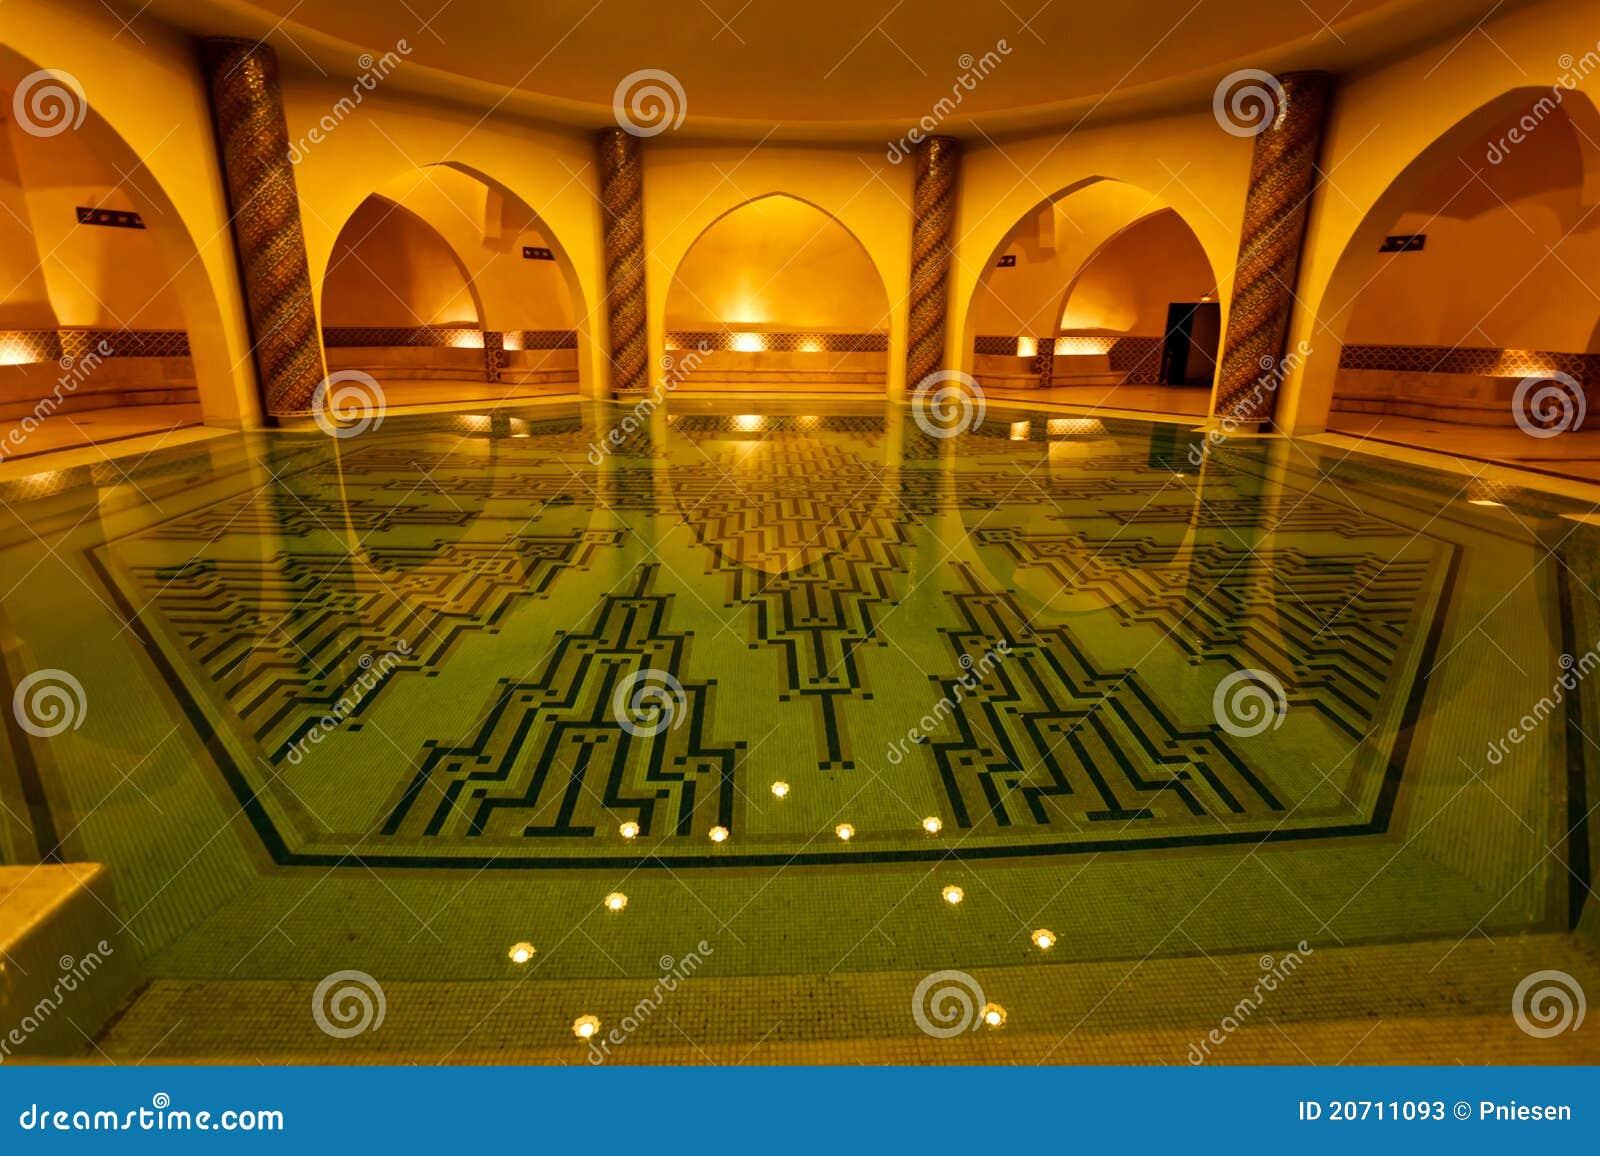 Baño Turco Arquitectura:Hammam Turkish Bath